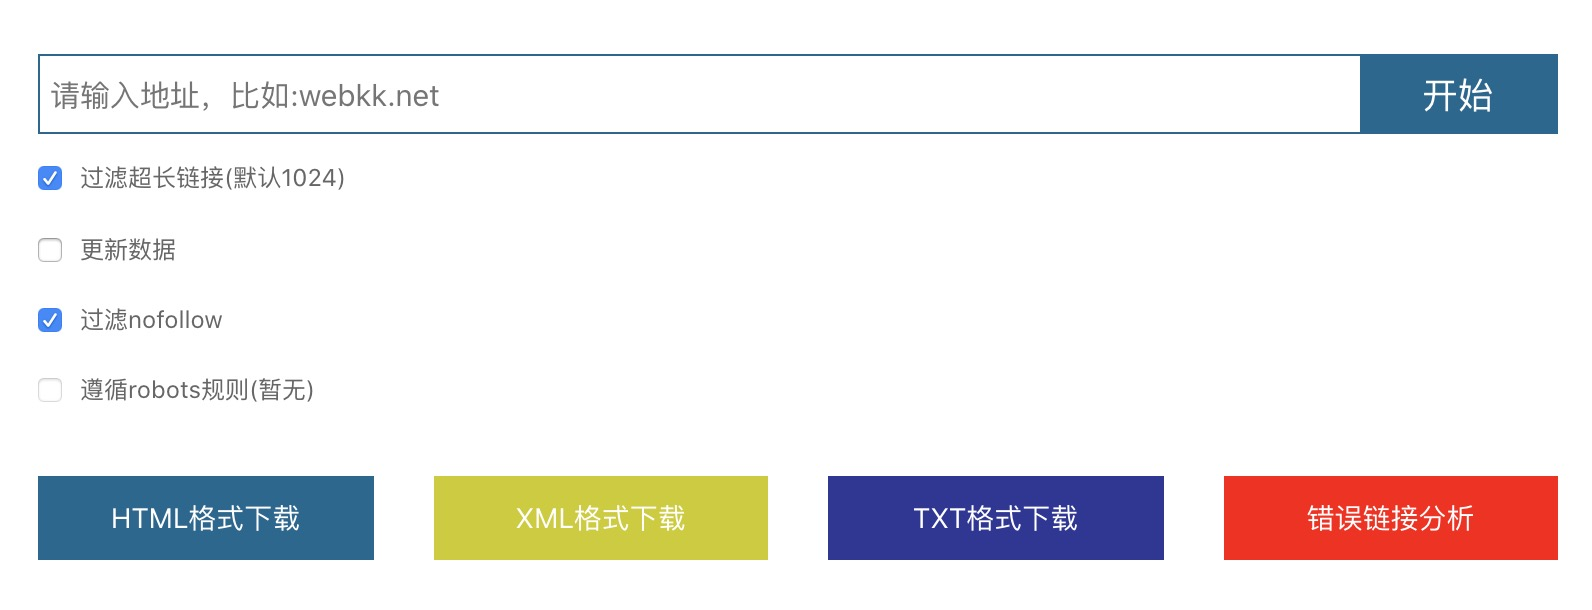 H71e6370b68304531bc1c8ef634a4c354K - 网站地图在线生成工具xml sitemaps使用教程